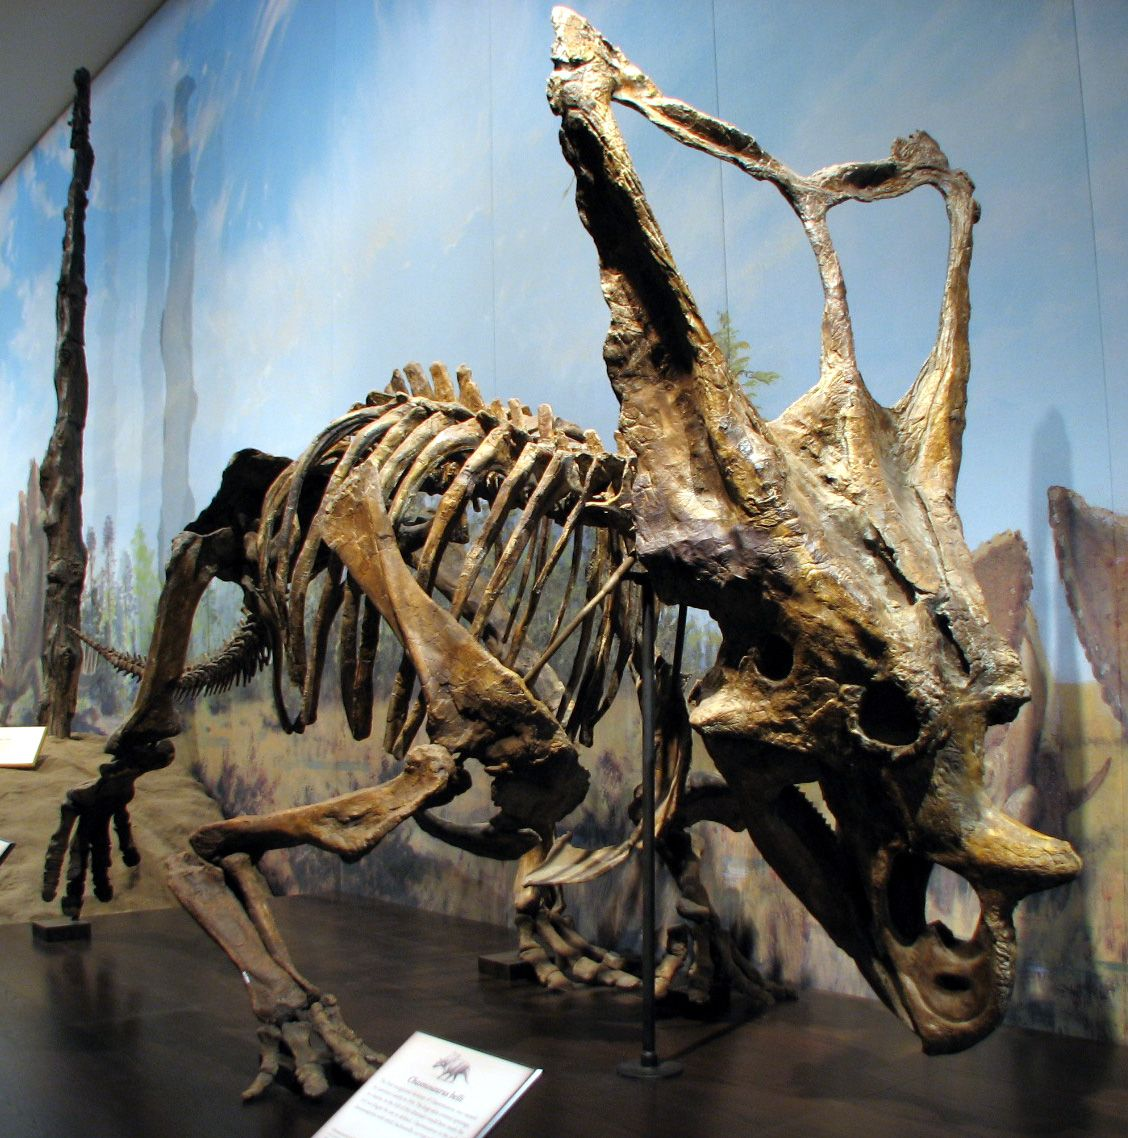 Fonte de Chasmosaurus belli, ROM 843, Royal Tyrrell Museum of Paleontology. Dinosauria, Ornithischia, Neornithischia, Ceratopsia, Ceratopsidae, Ceratopsinae. Auteur : ceasol, 2008.